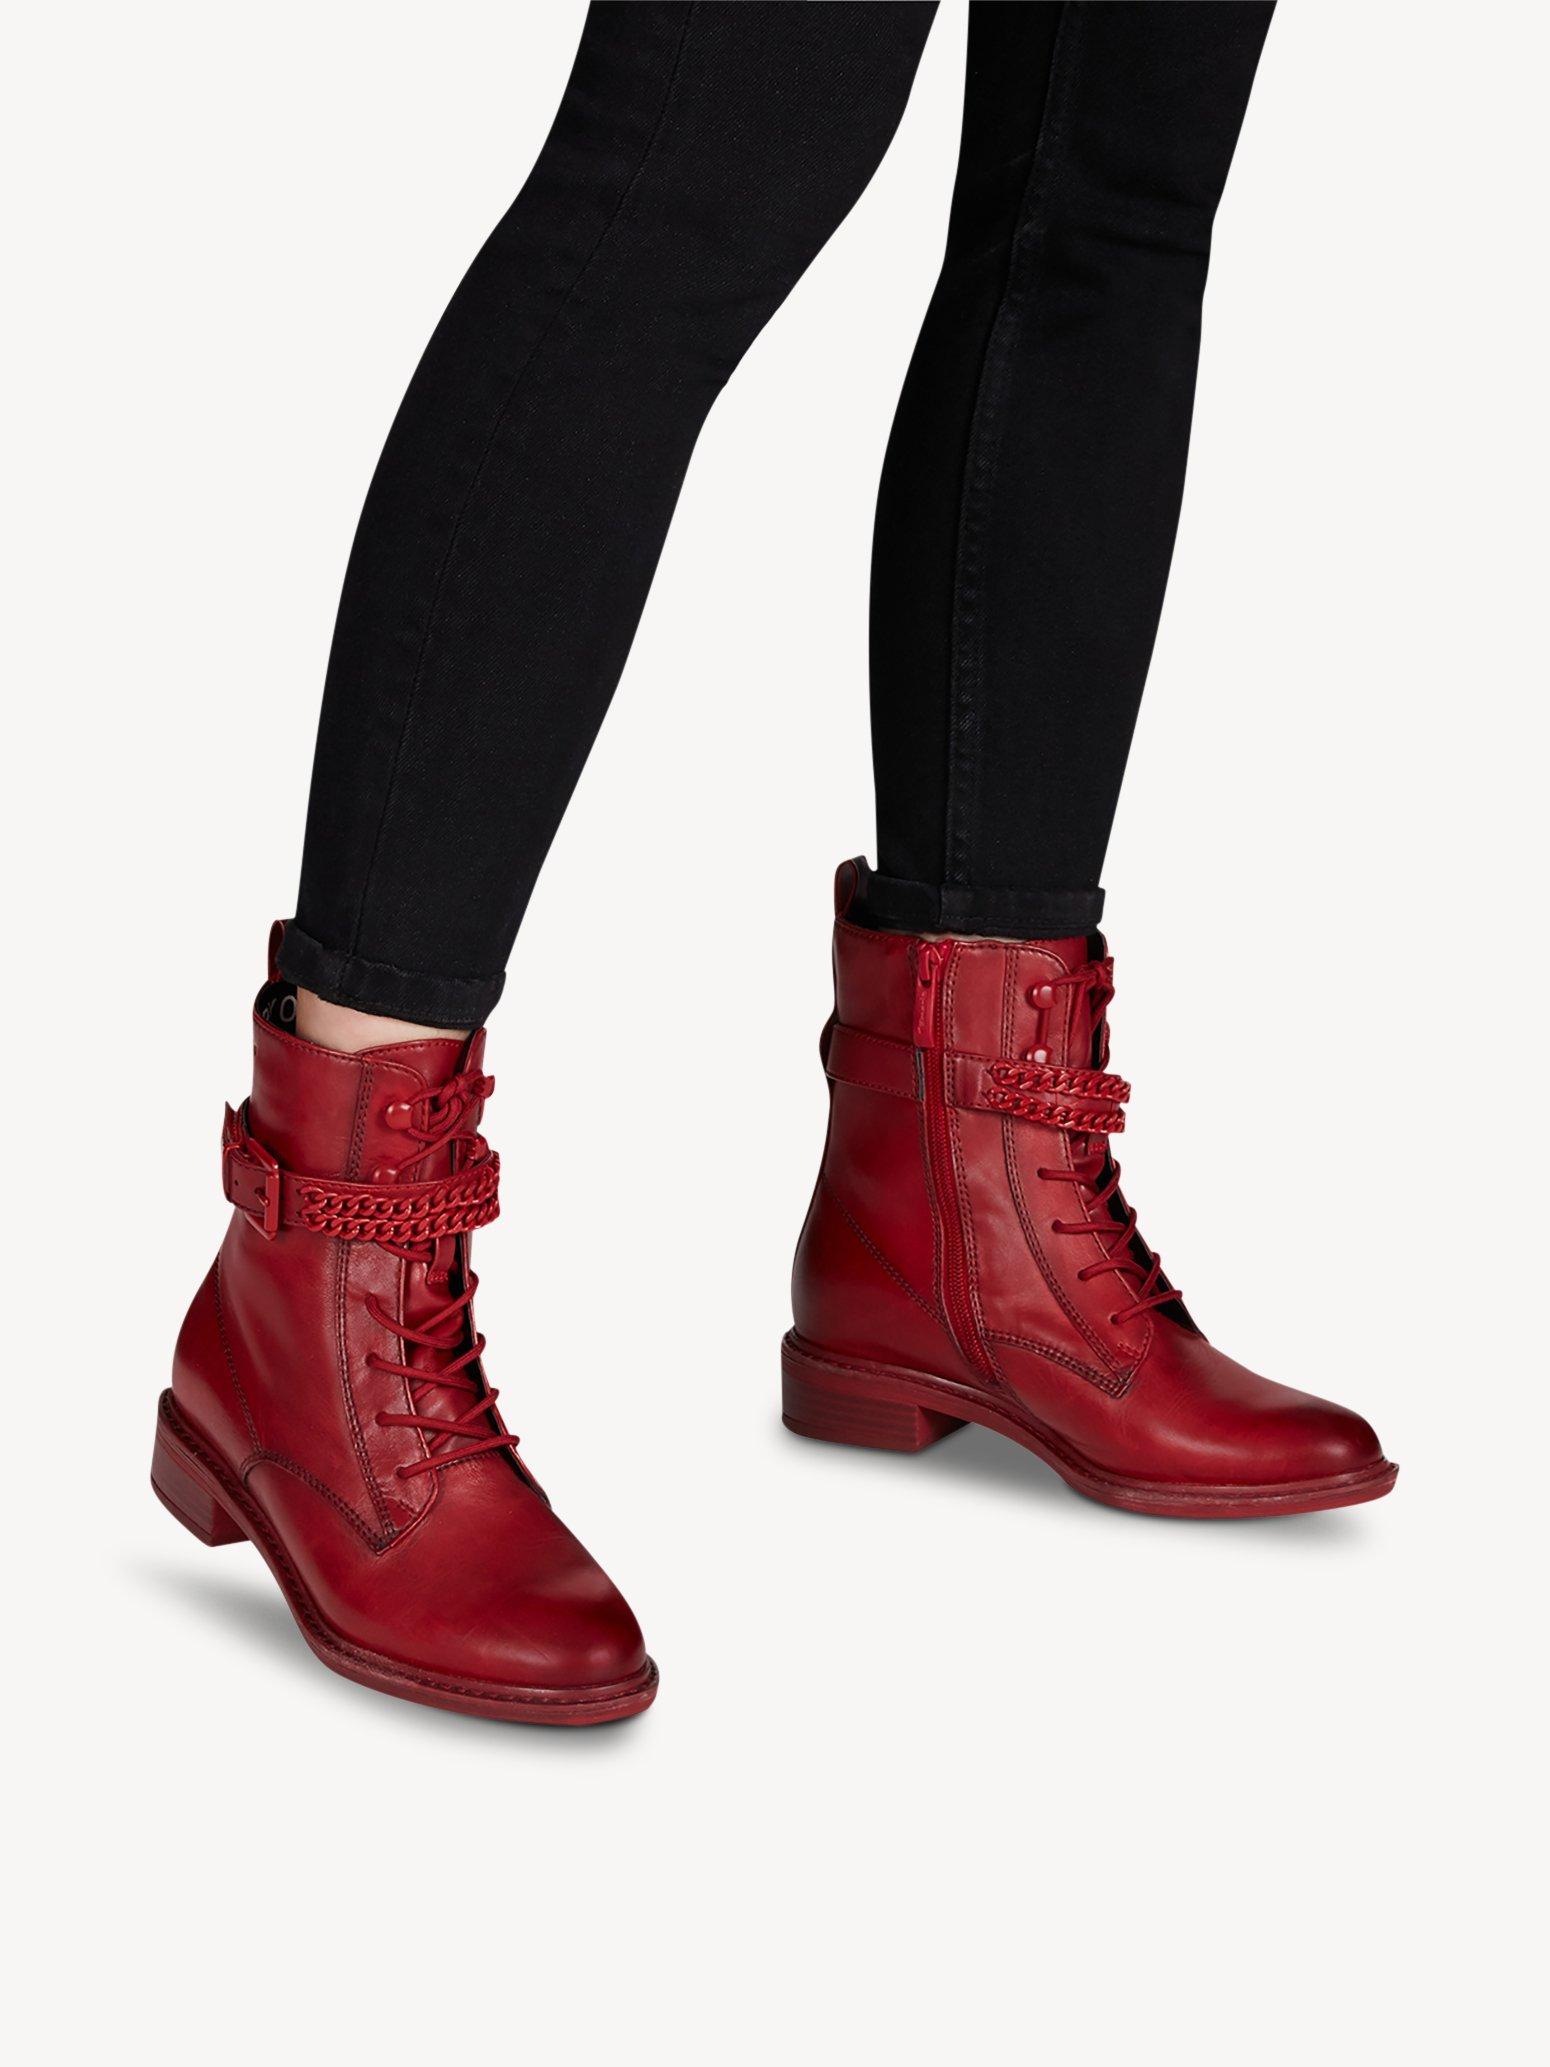 Ботинки Tamaris 1-1-25114-25-551